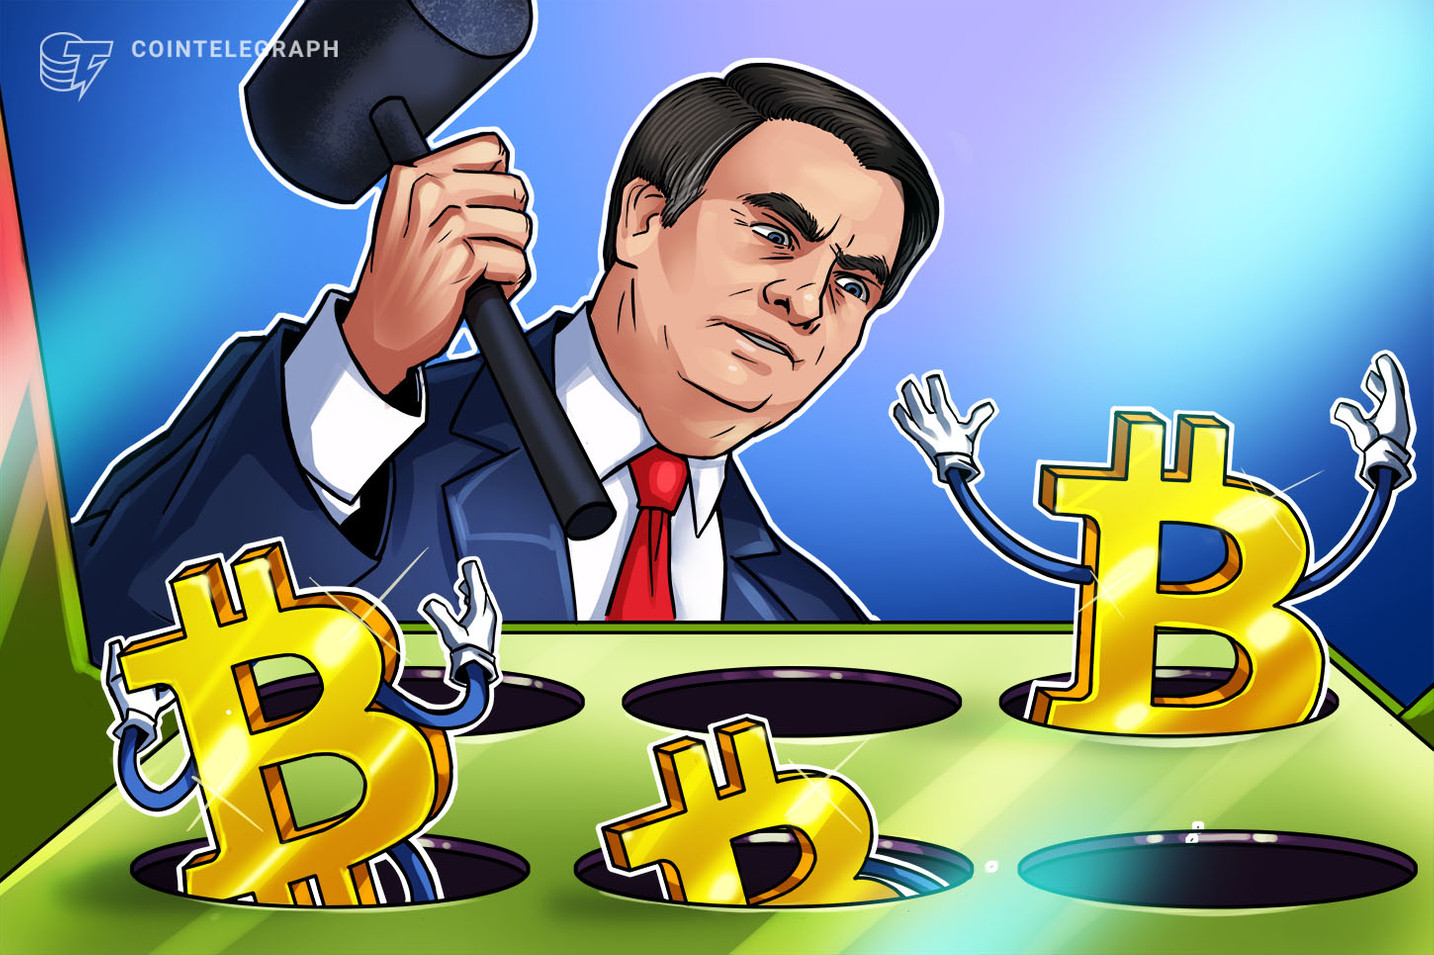 Hashtag no Twitter pede para 'guru do Bolsonaro' usar Bitcoin após Paypal excluir conta de Olavo de Carvalho